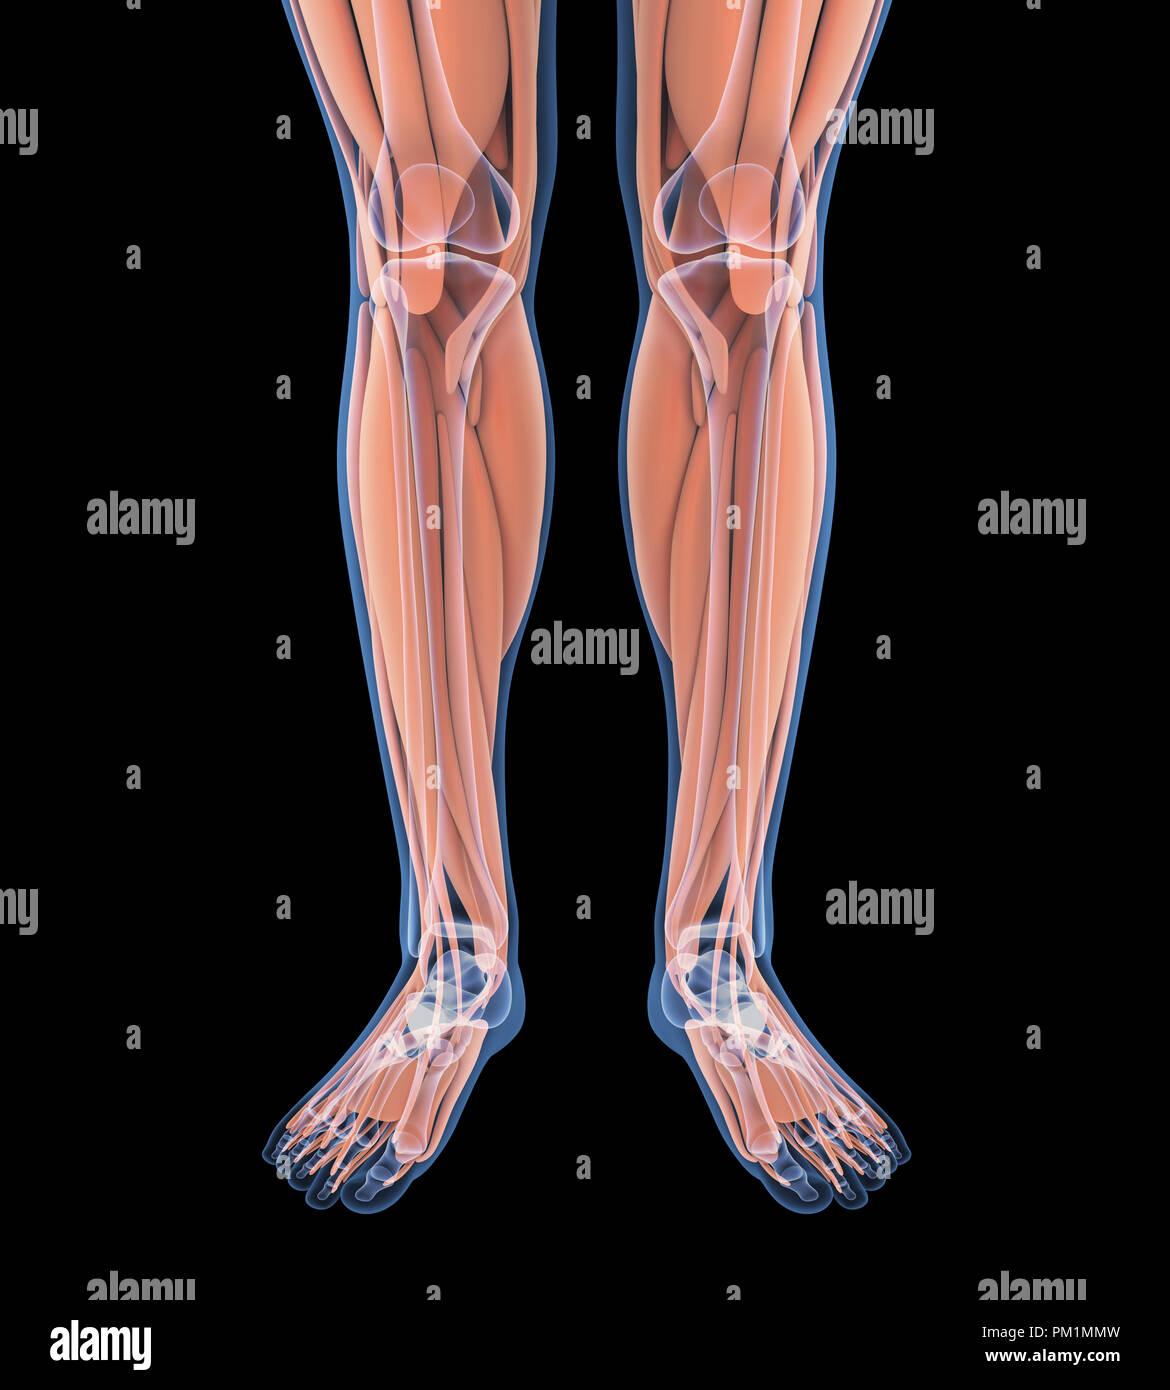 Leg Muscle Fiber Stock Photos Leg Muscle Fiber Stock Images Alamy